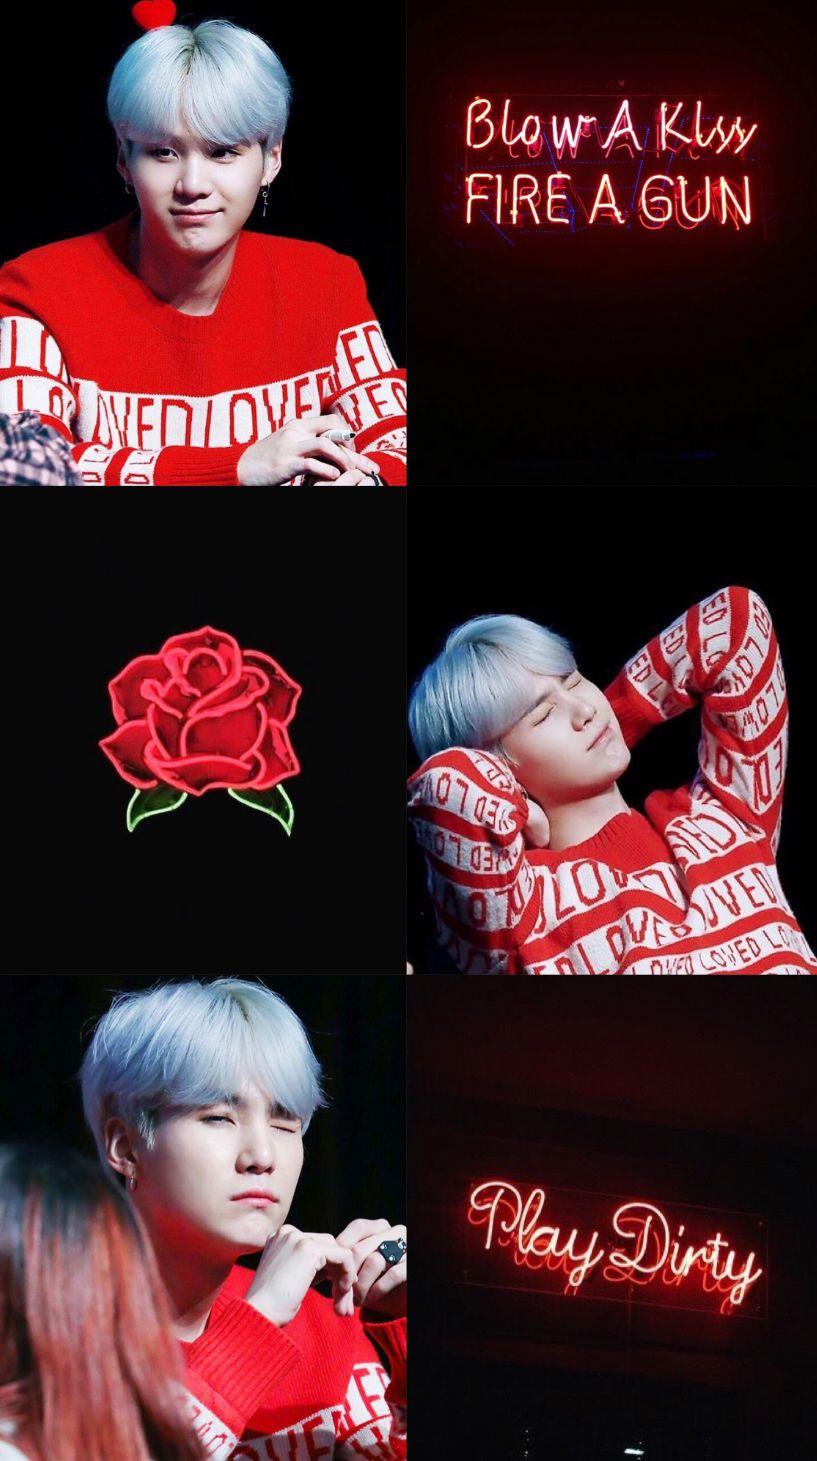 Suga Bts Collage And Aesthetic Suga Bts Aesthetic Collage Red Black Minyoongi Red Aesthetic Black Aesthetic Suga